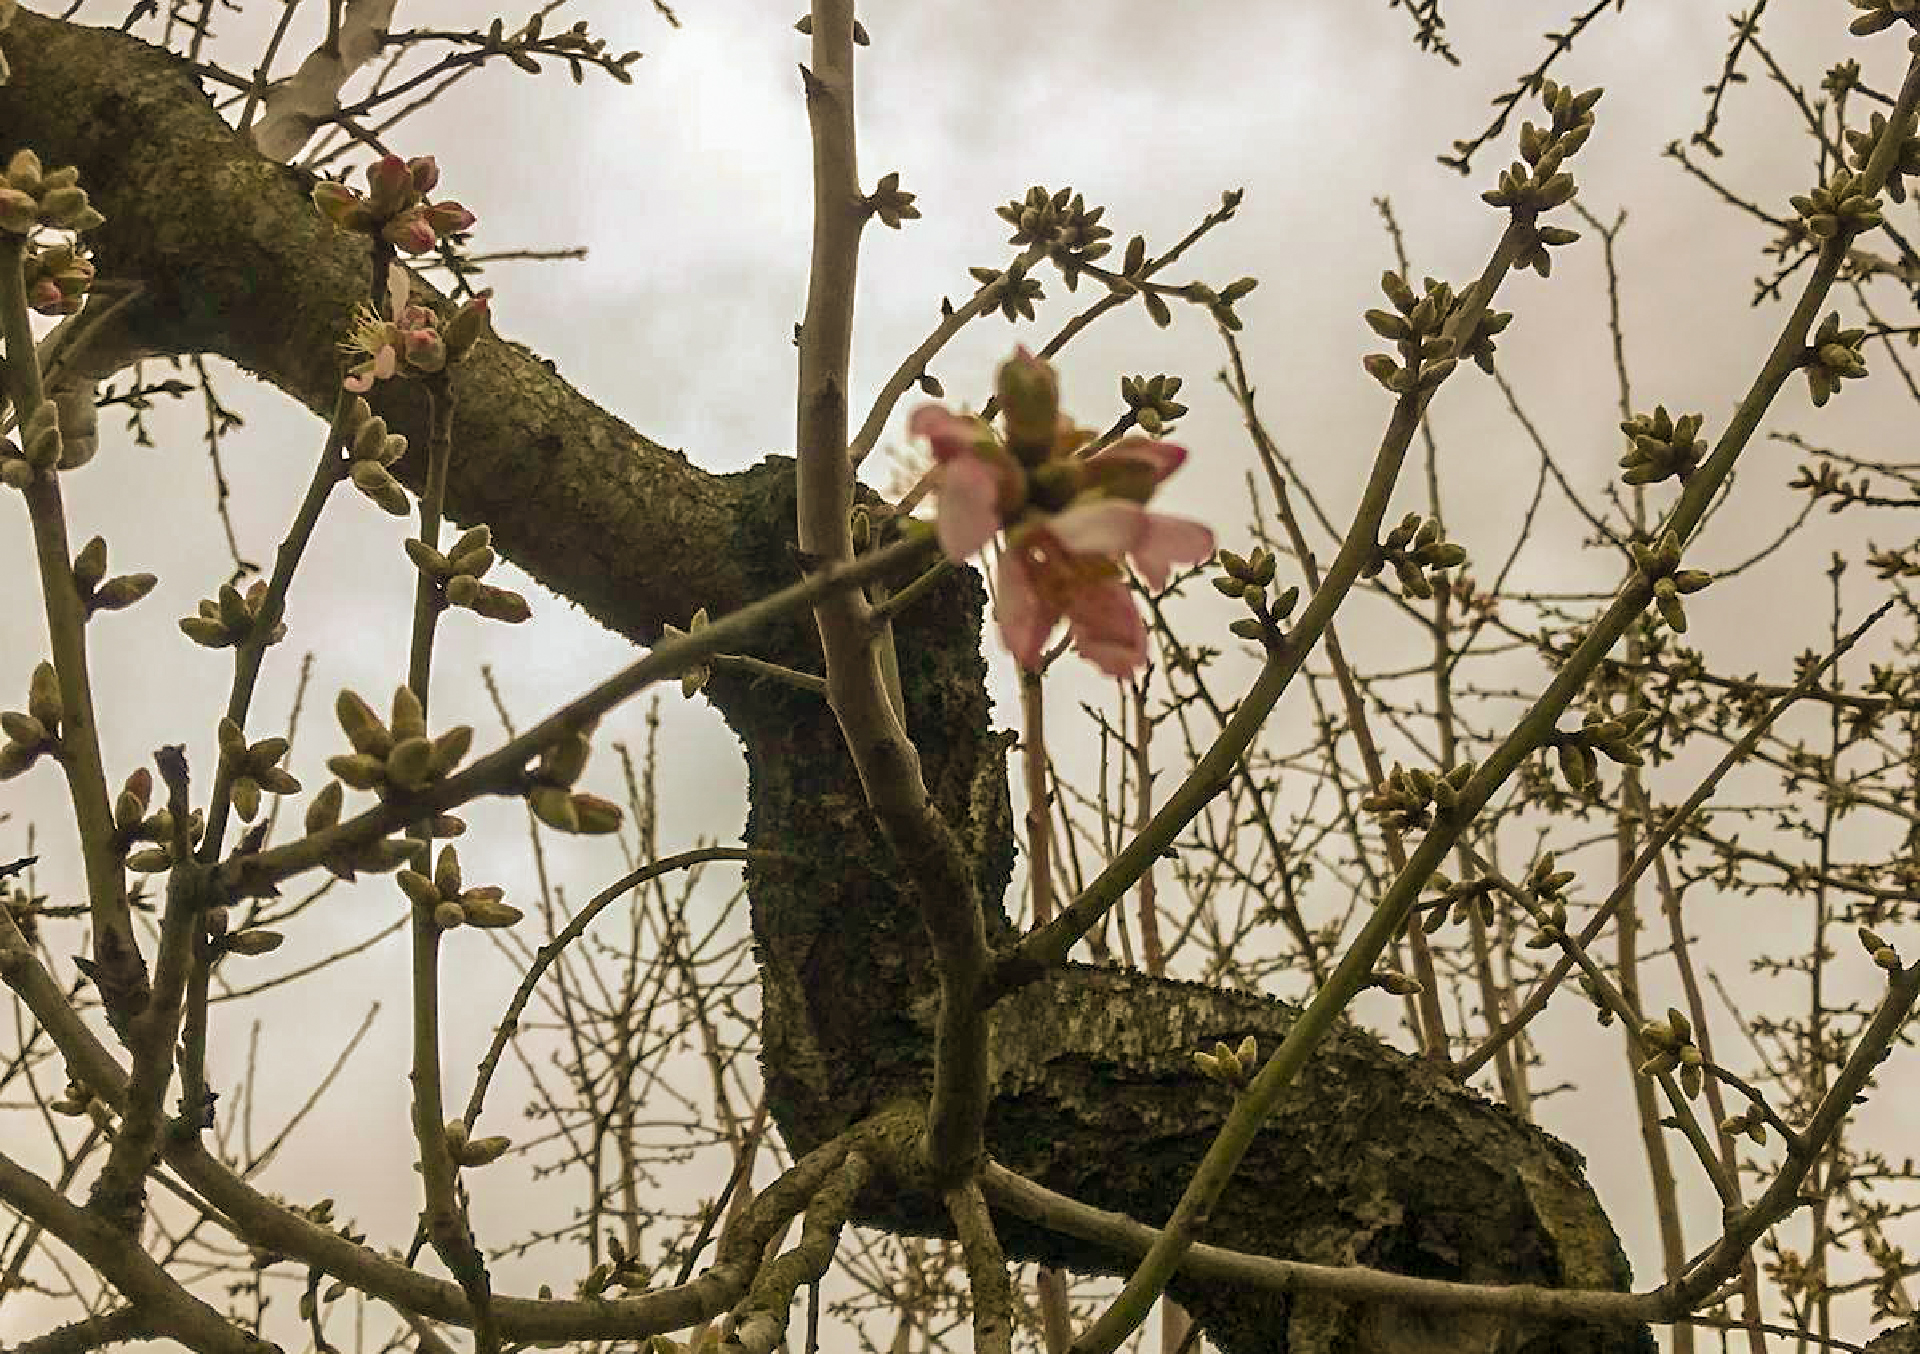 Pianta fiorita